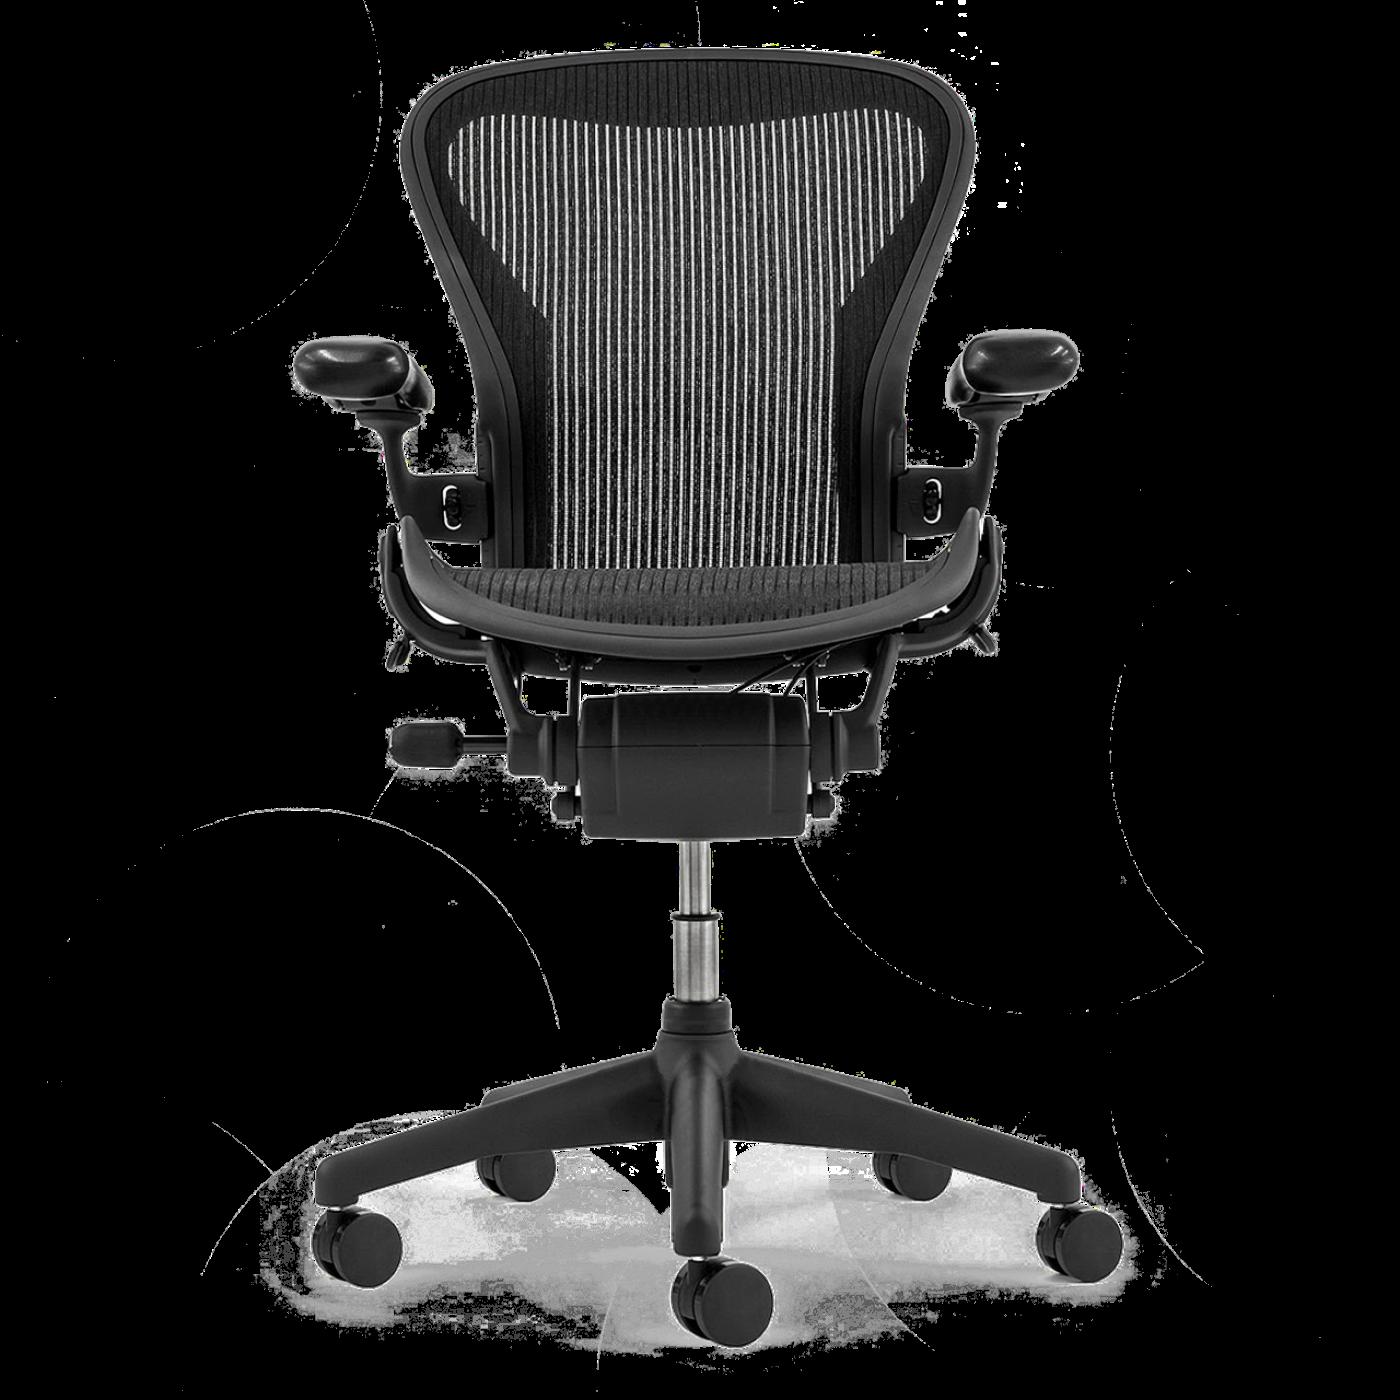 Aeron-forside